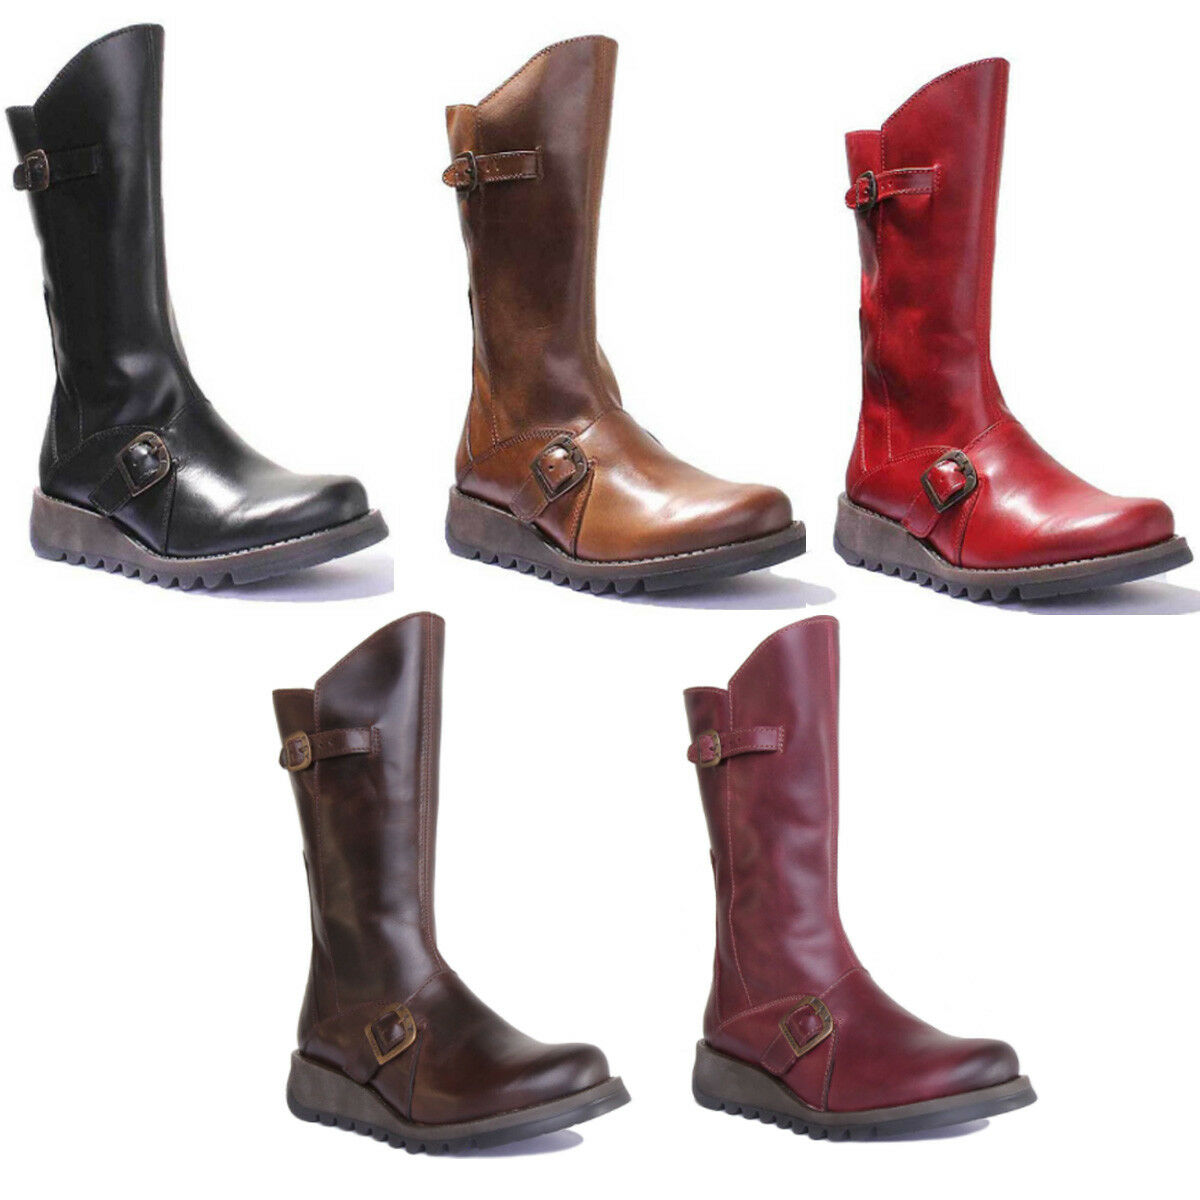 Fly London Mes 2 Women Brown Leather Matt Long Boots